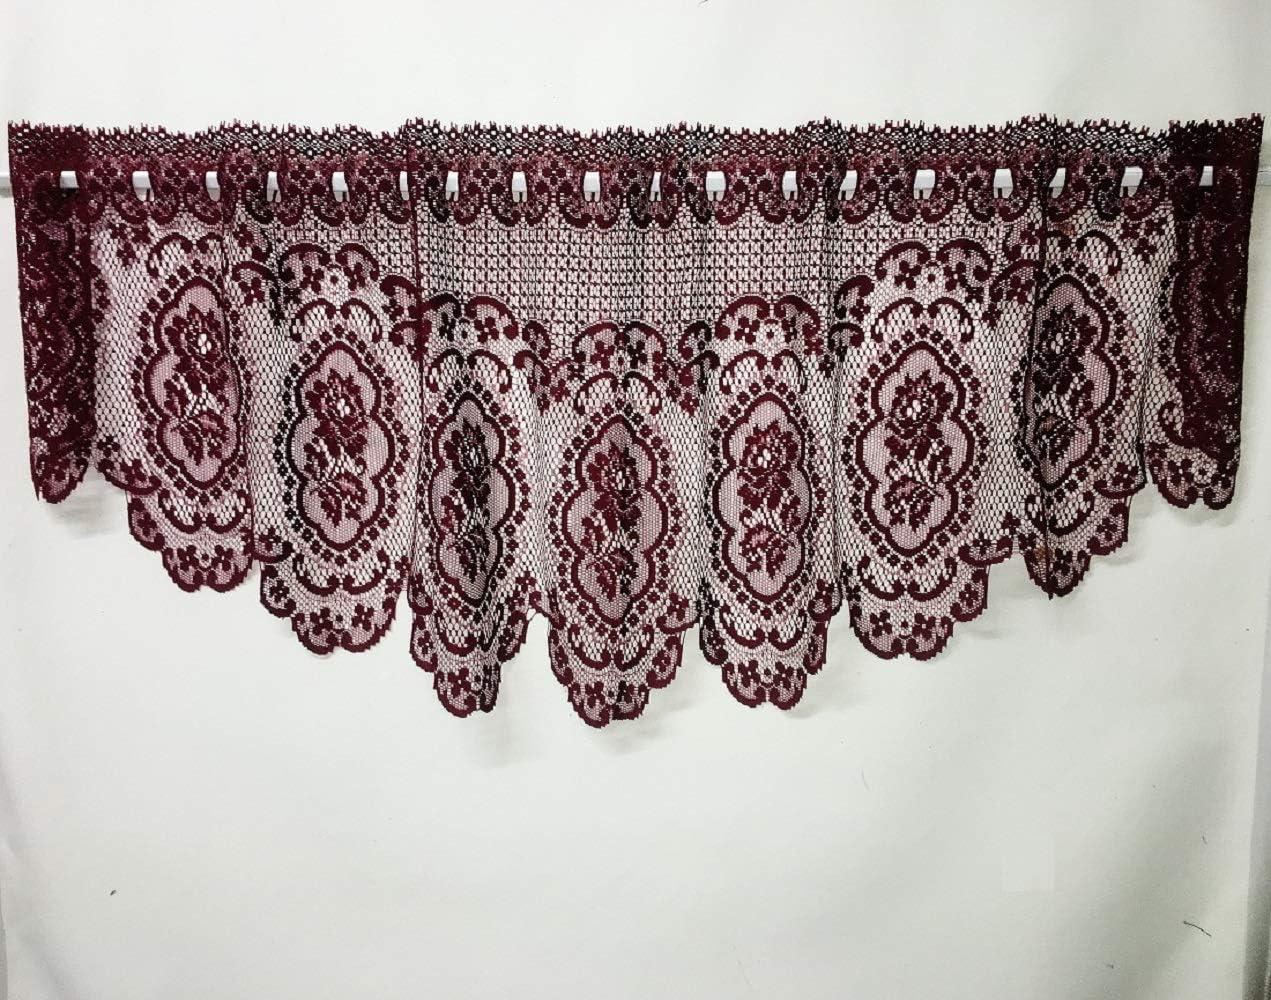 Heritage Lace Cameo Rose Festoon Valance